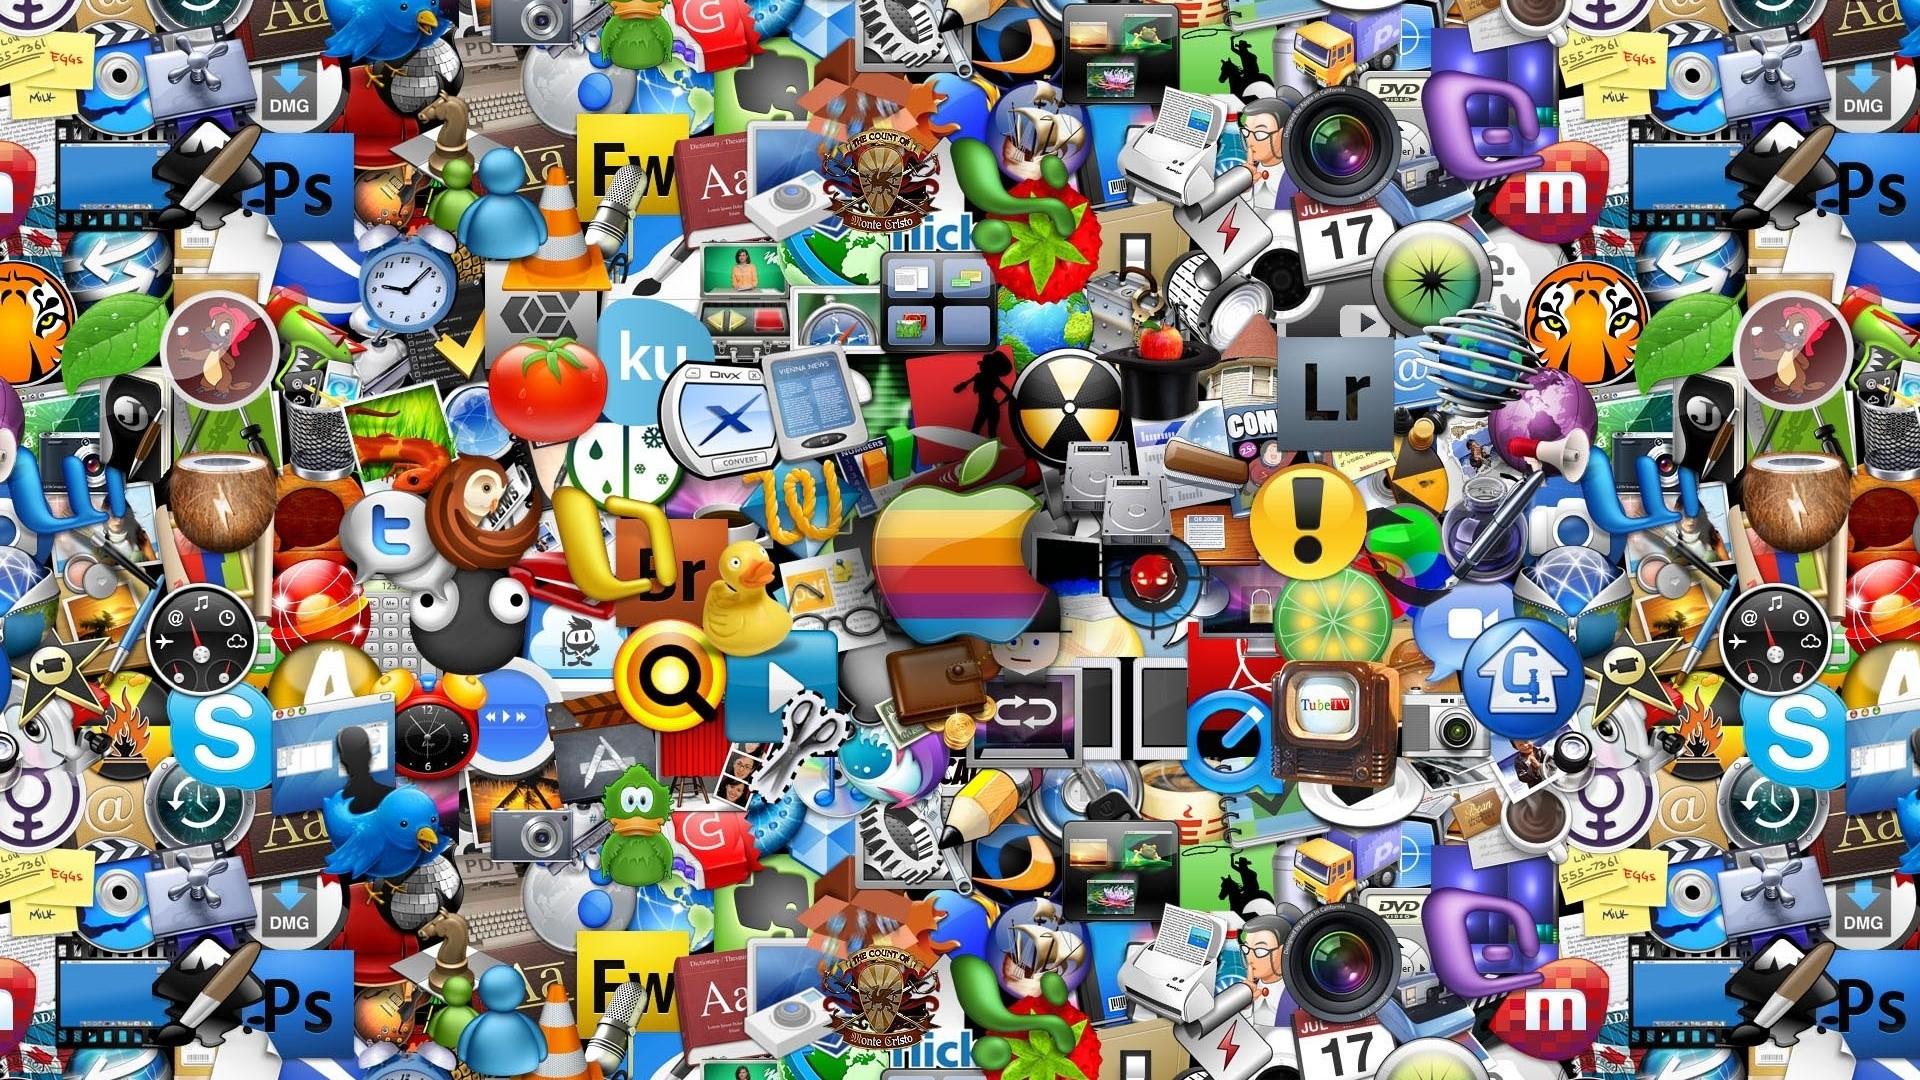 HD Social 4k Wallpapers